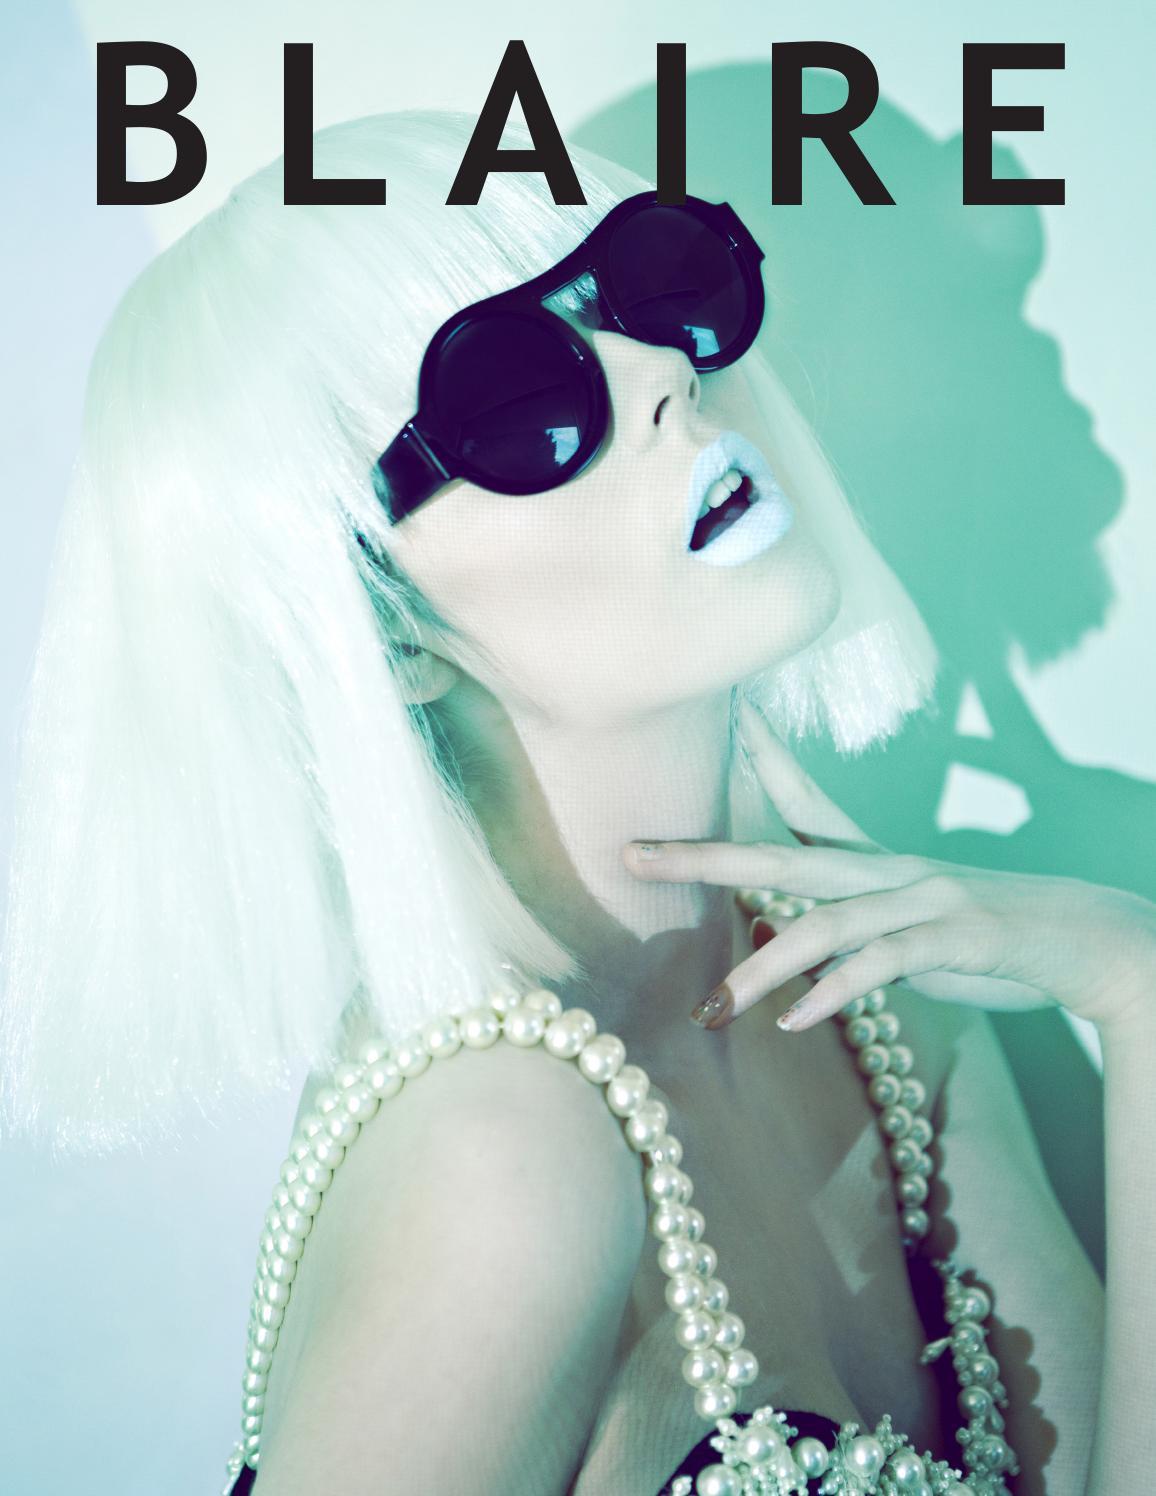 Blaire Banks Nude Photos 16